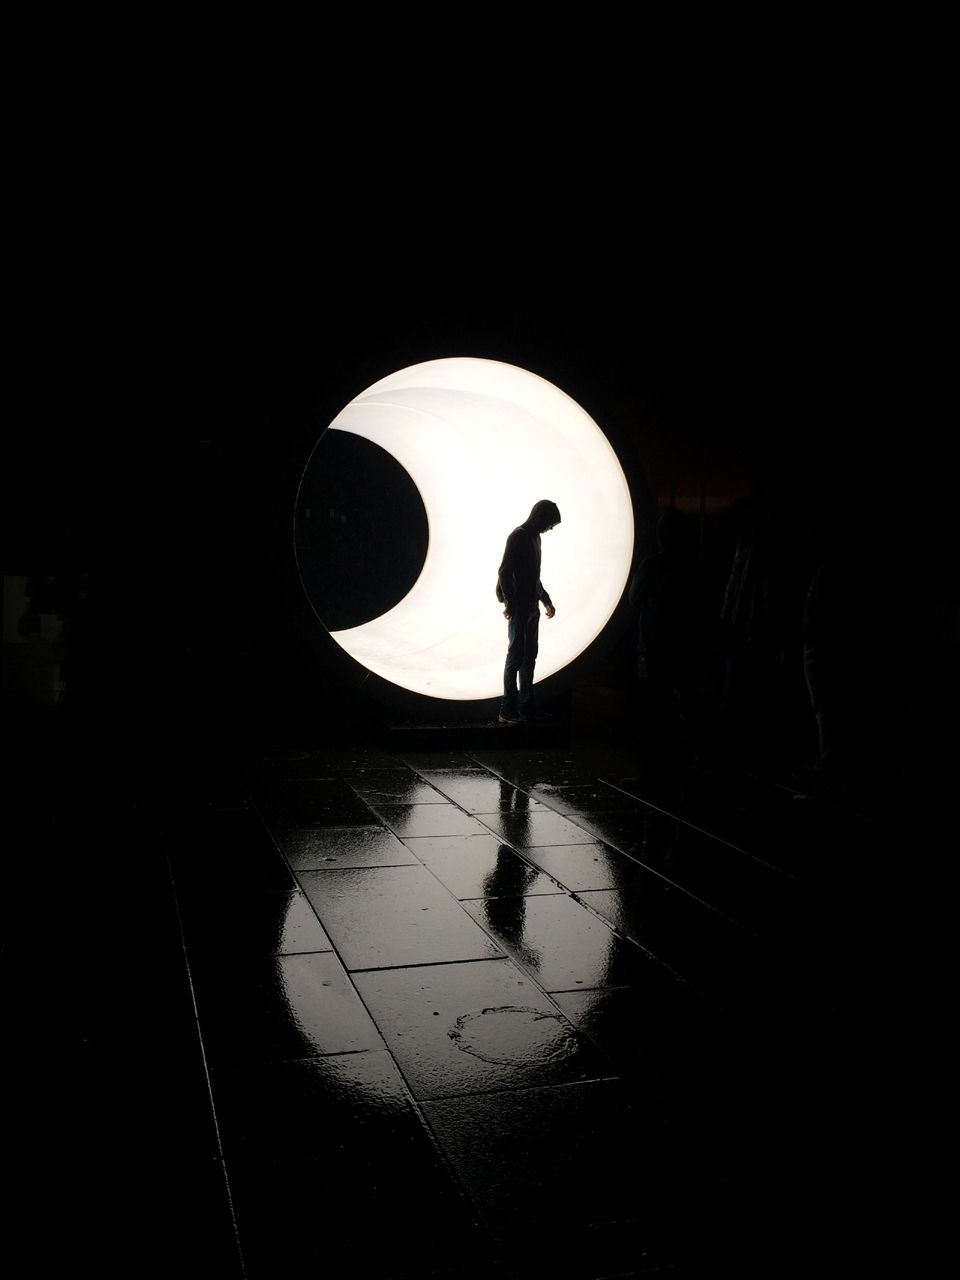 Installations Accent Stuttgart Region During Light Art Festival